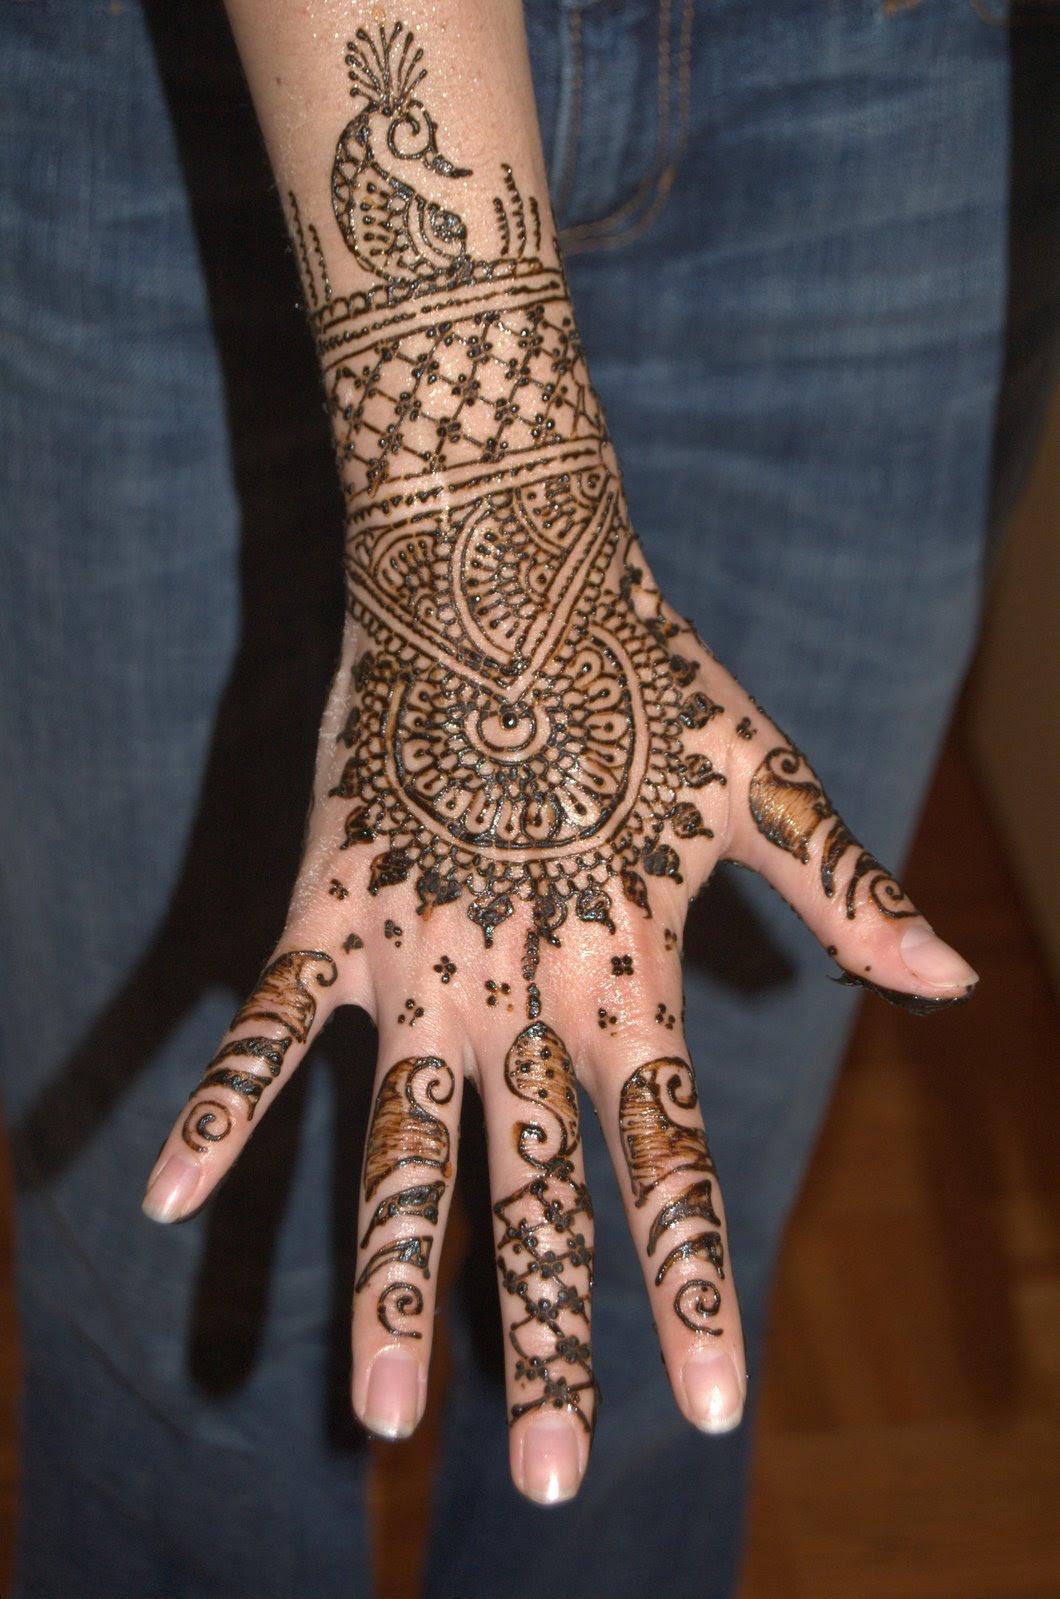 Finita39s Blog Henna